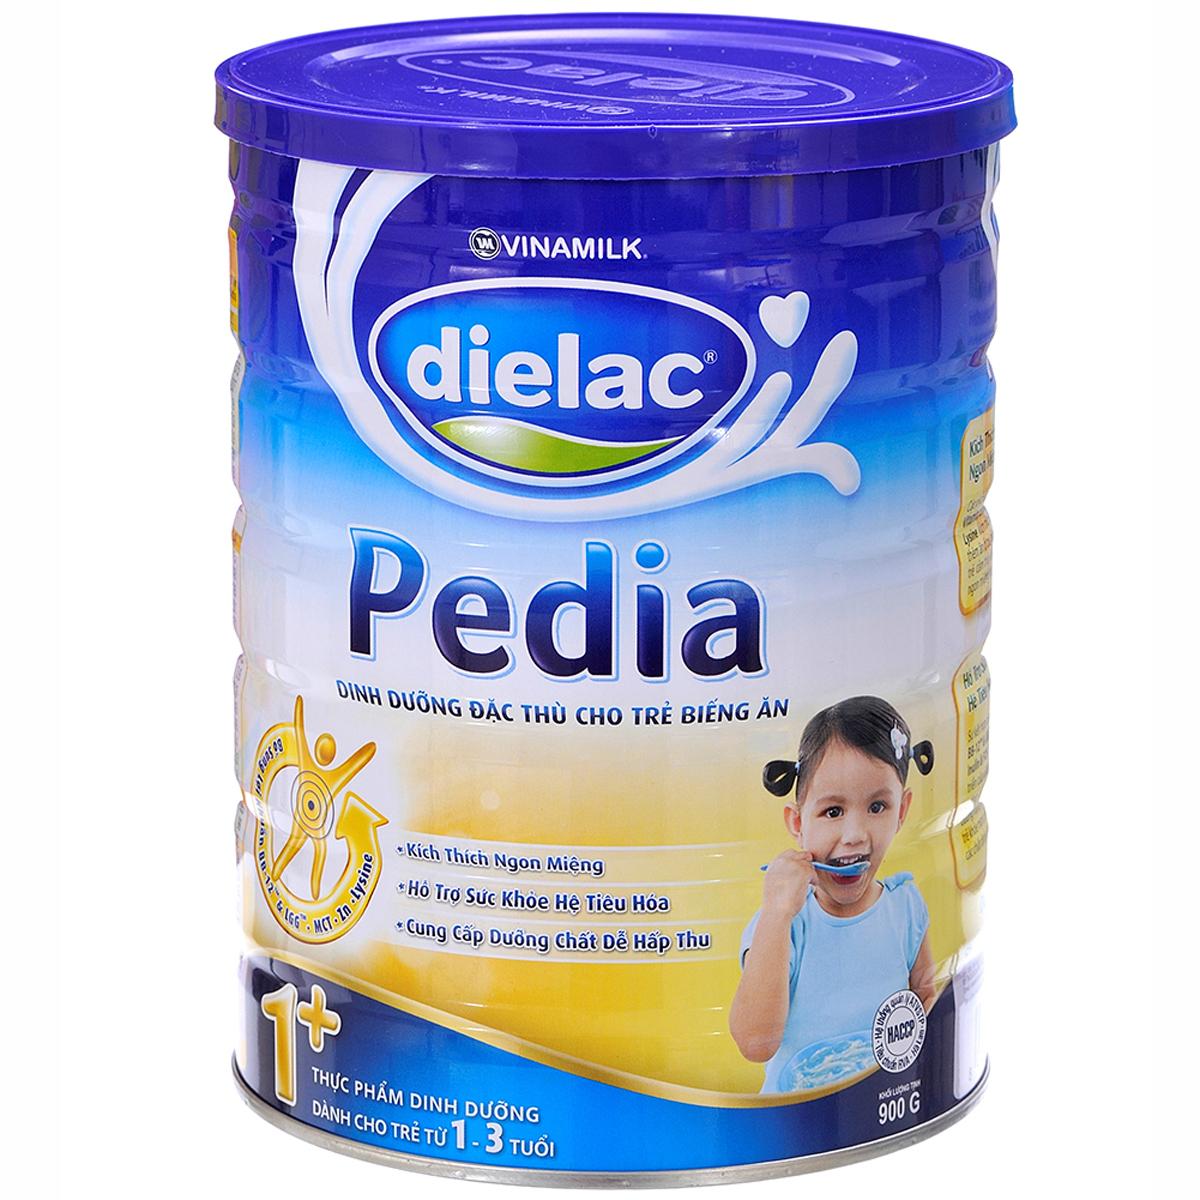 Sua bot Dielac Pedia 1+ hop thiec 900g